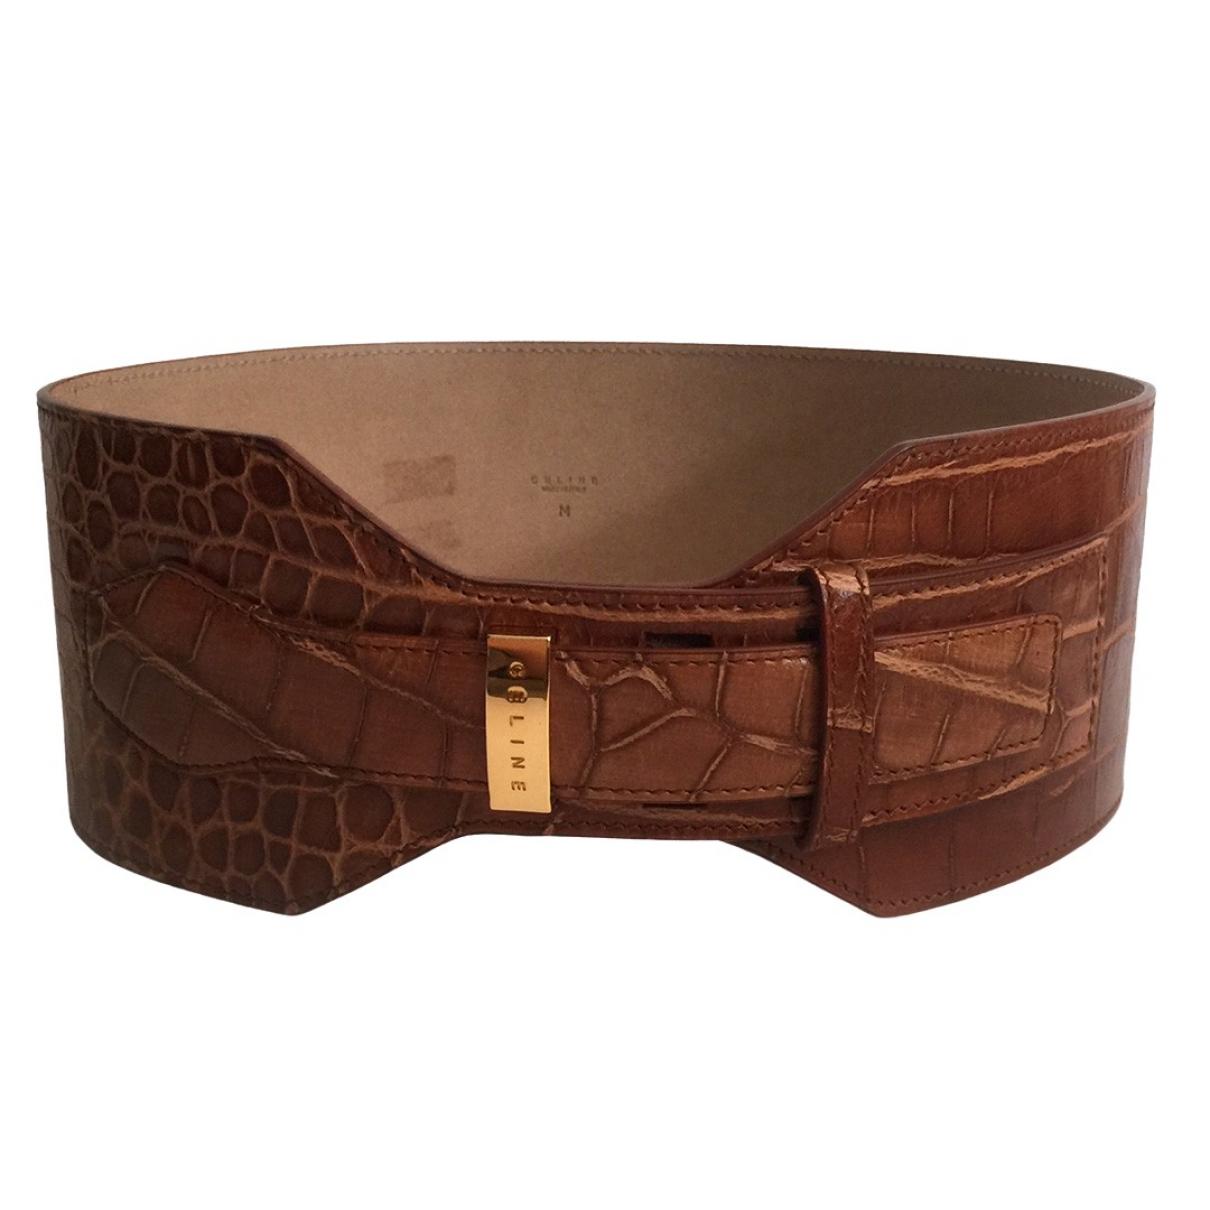 Celine \N Camel Leather belt for Women M International